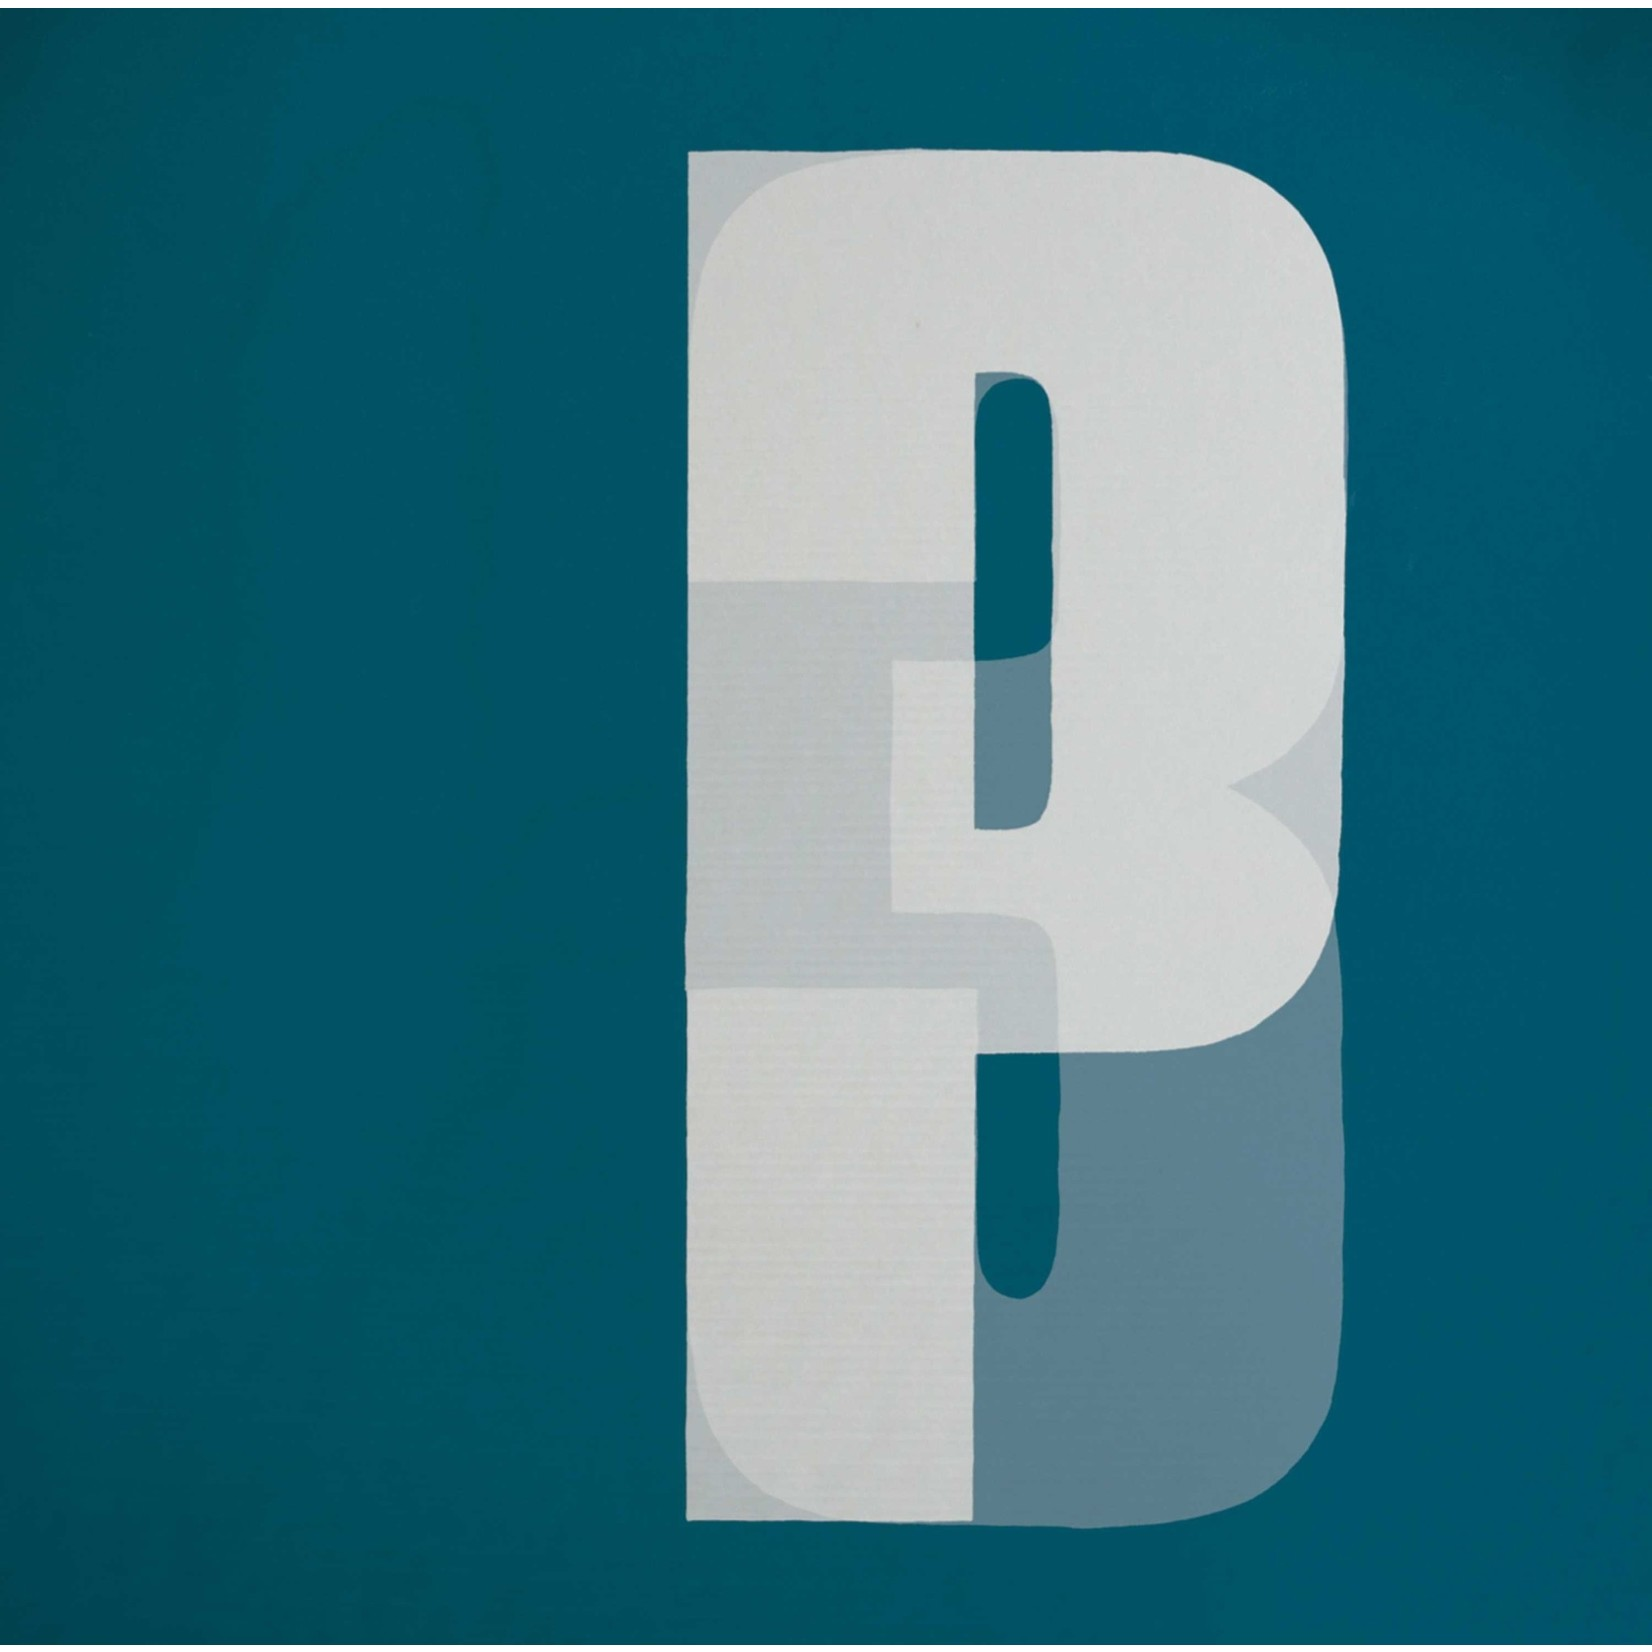 [New] Portishead: Third (2LP)